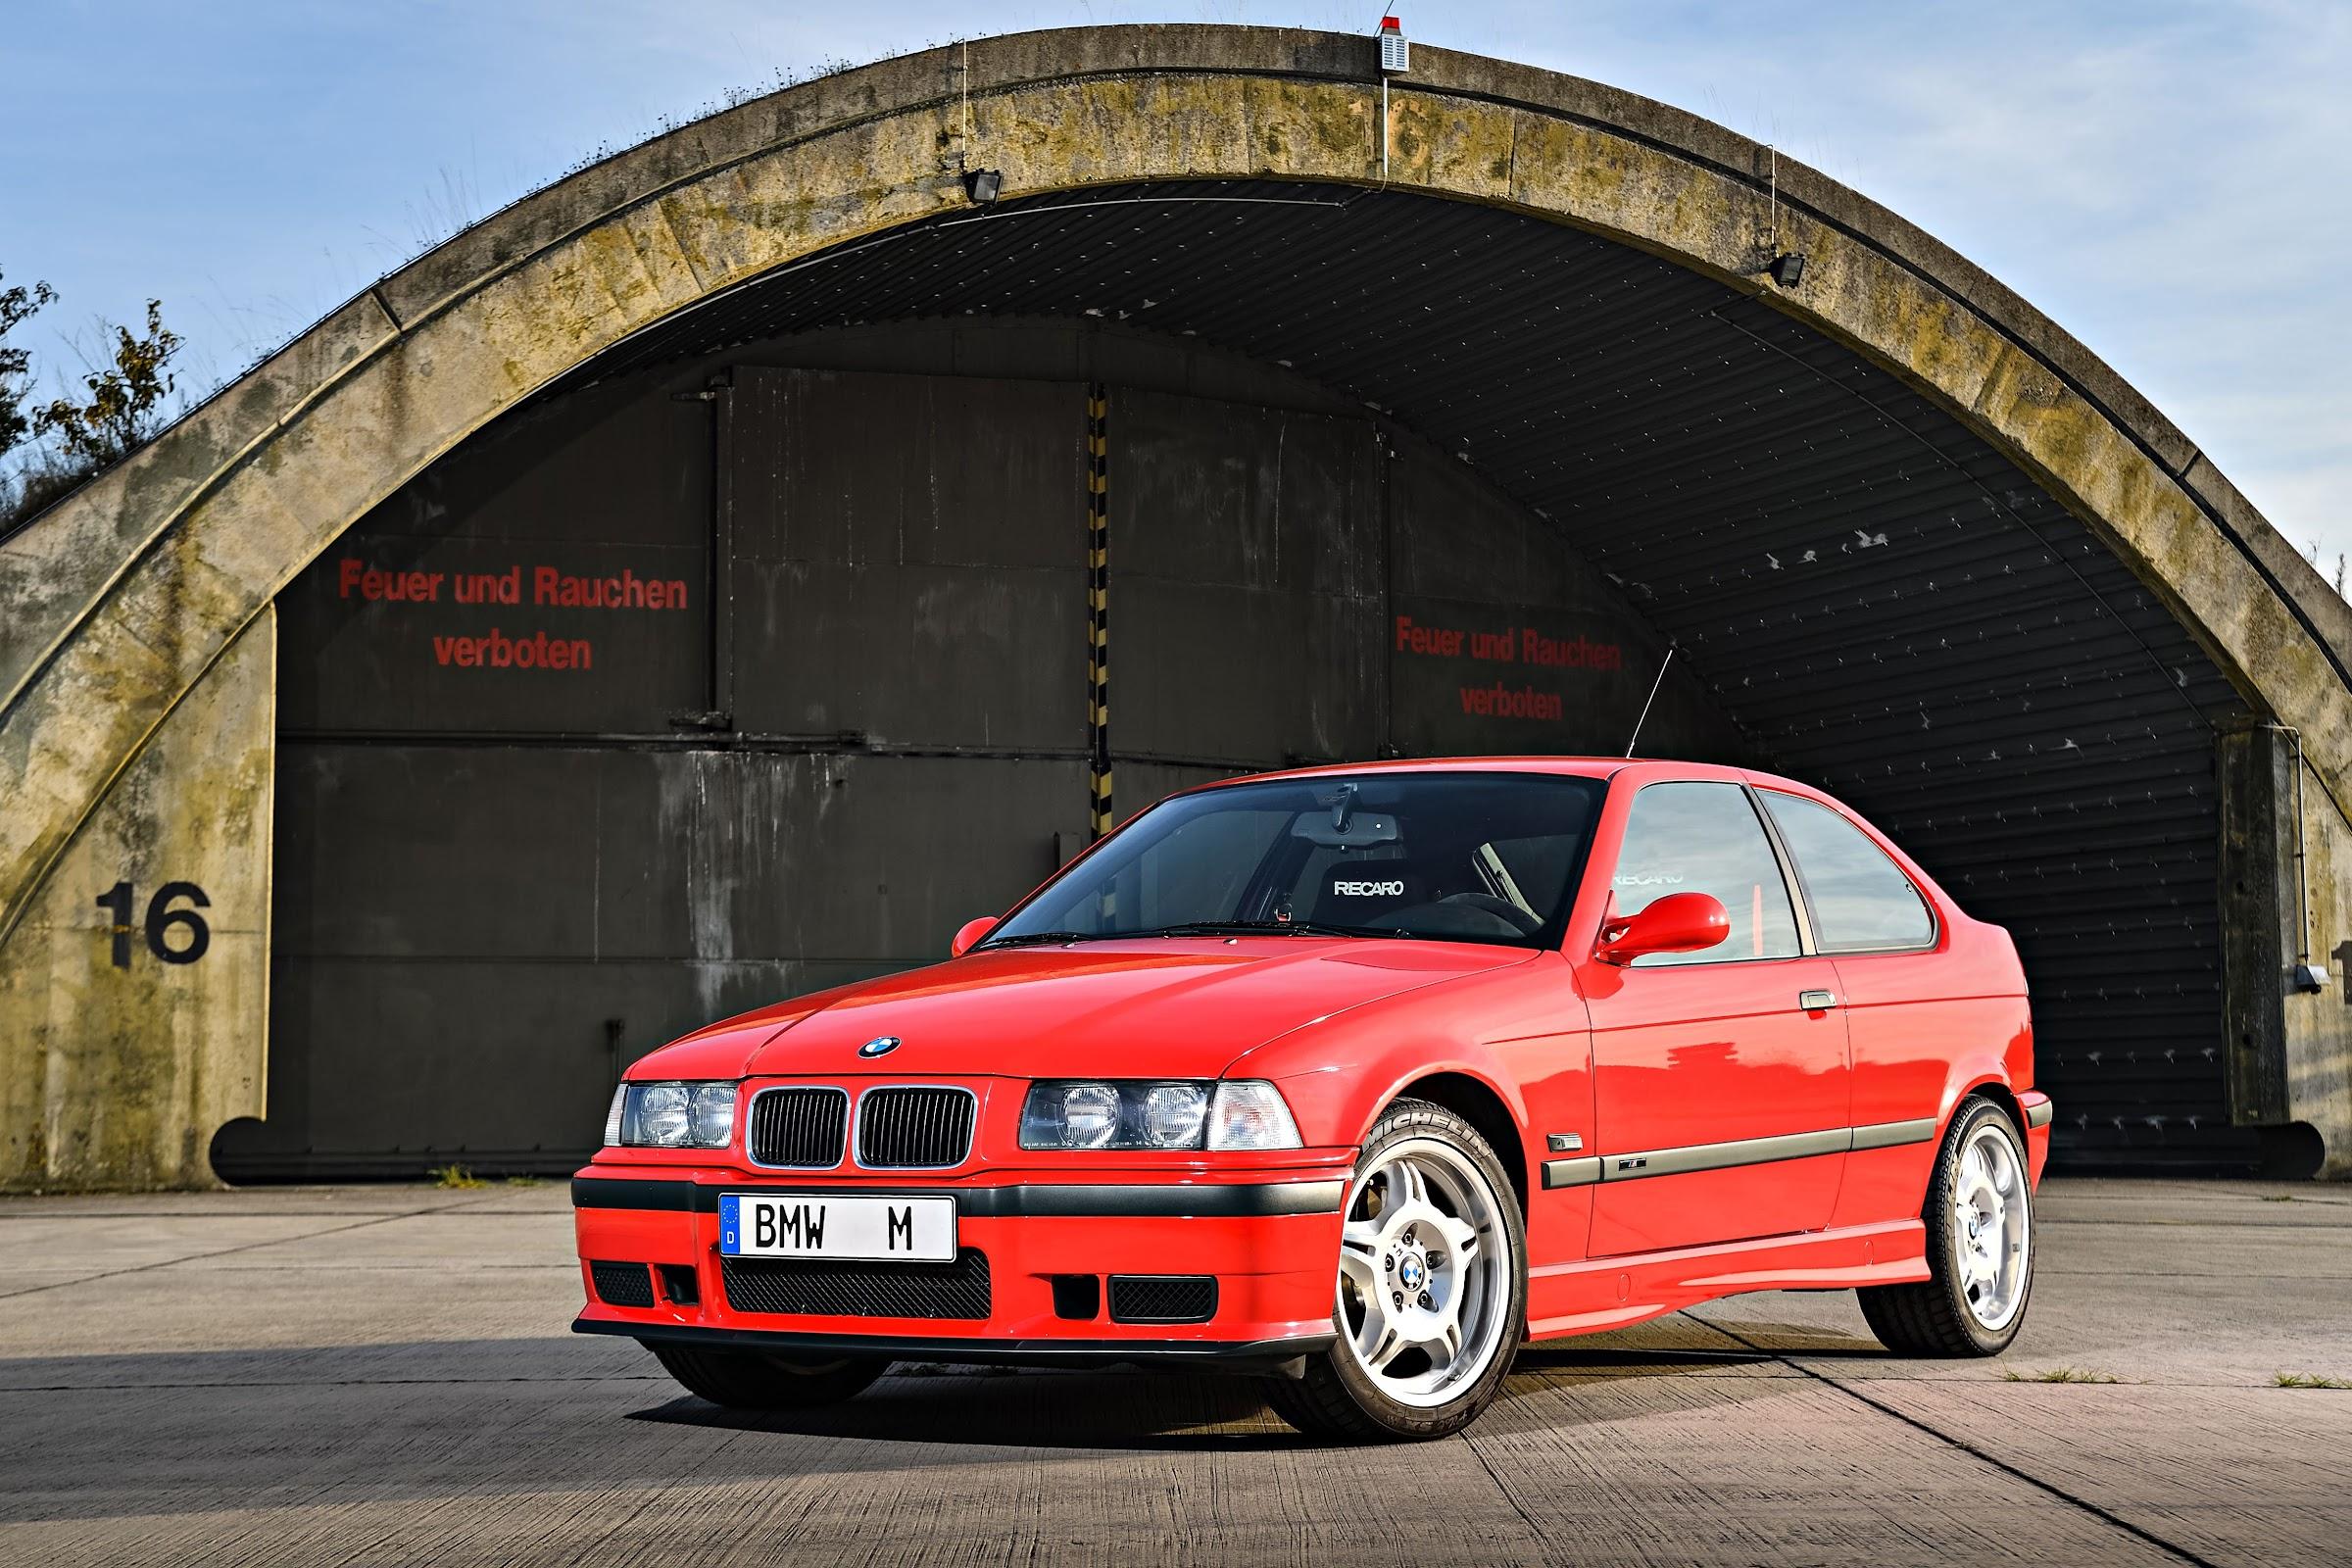 KU8TKS5PI3buRHjw2UCWCtaAsdi2XGyVrtx8qeJvPEBfKuUN5tHfTVvaNSGfLFPP 0gEWMtzK9nVsPkhFDqeg rLlaCDxJa07uTznPoWsV Nr0IBg9kKDOuPzvu0NdaZSQcH2Lyd7Q=w2400 - Los prototipos del BMW M3 más curiosos